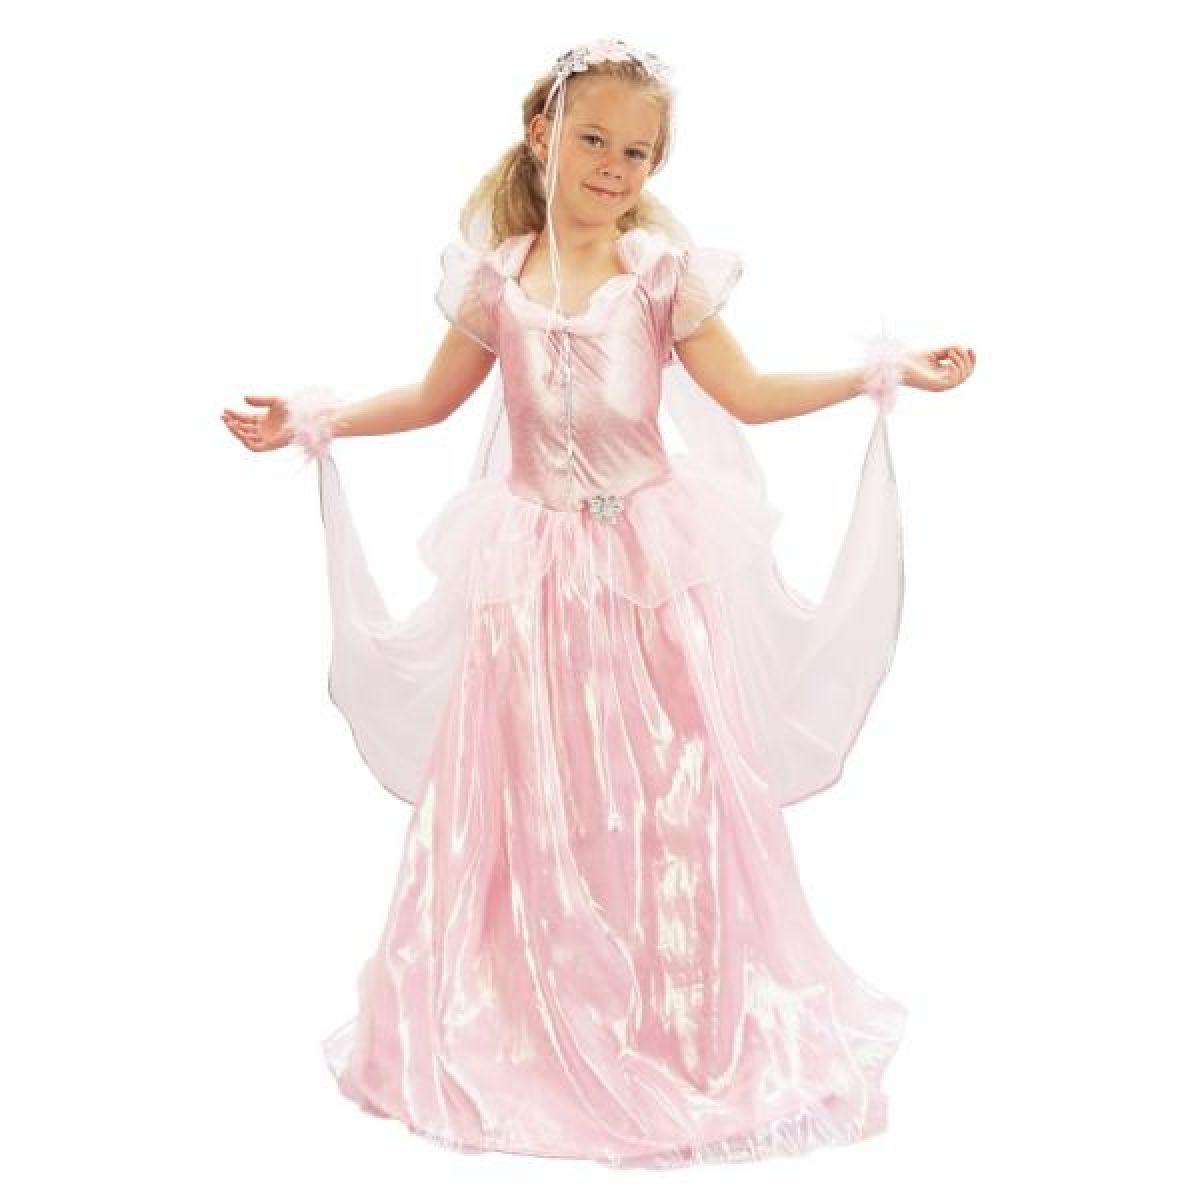 Made Dětský kostým Princezna růžová vel. M